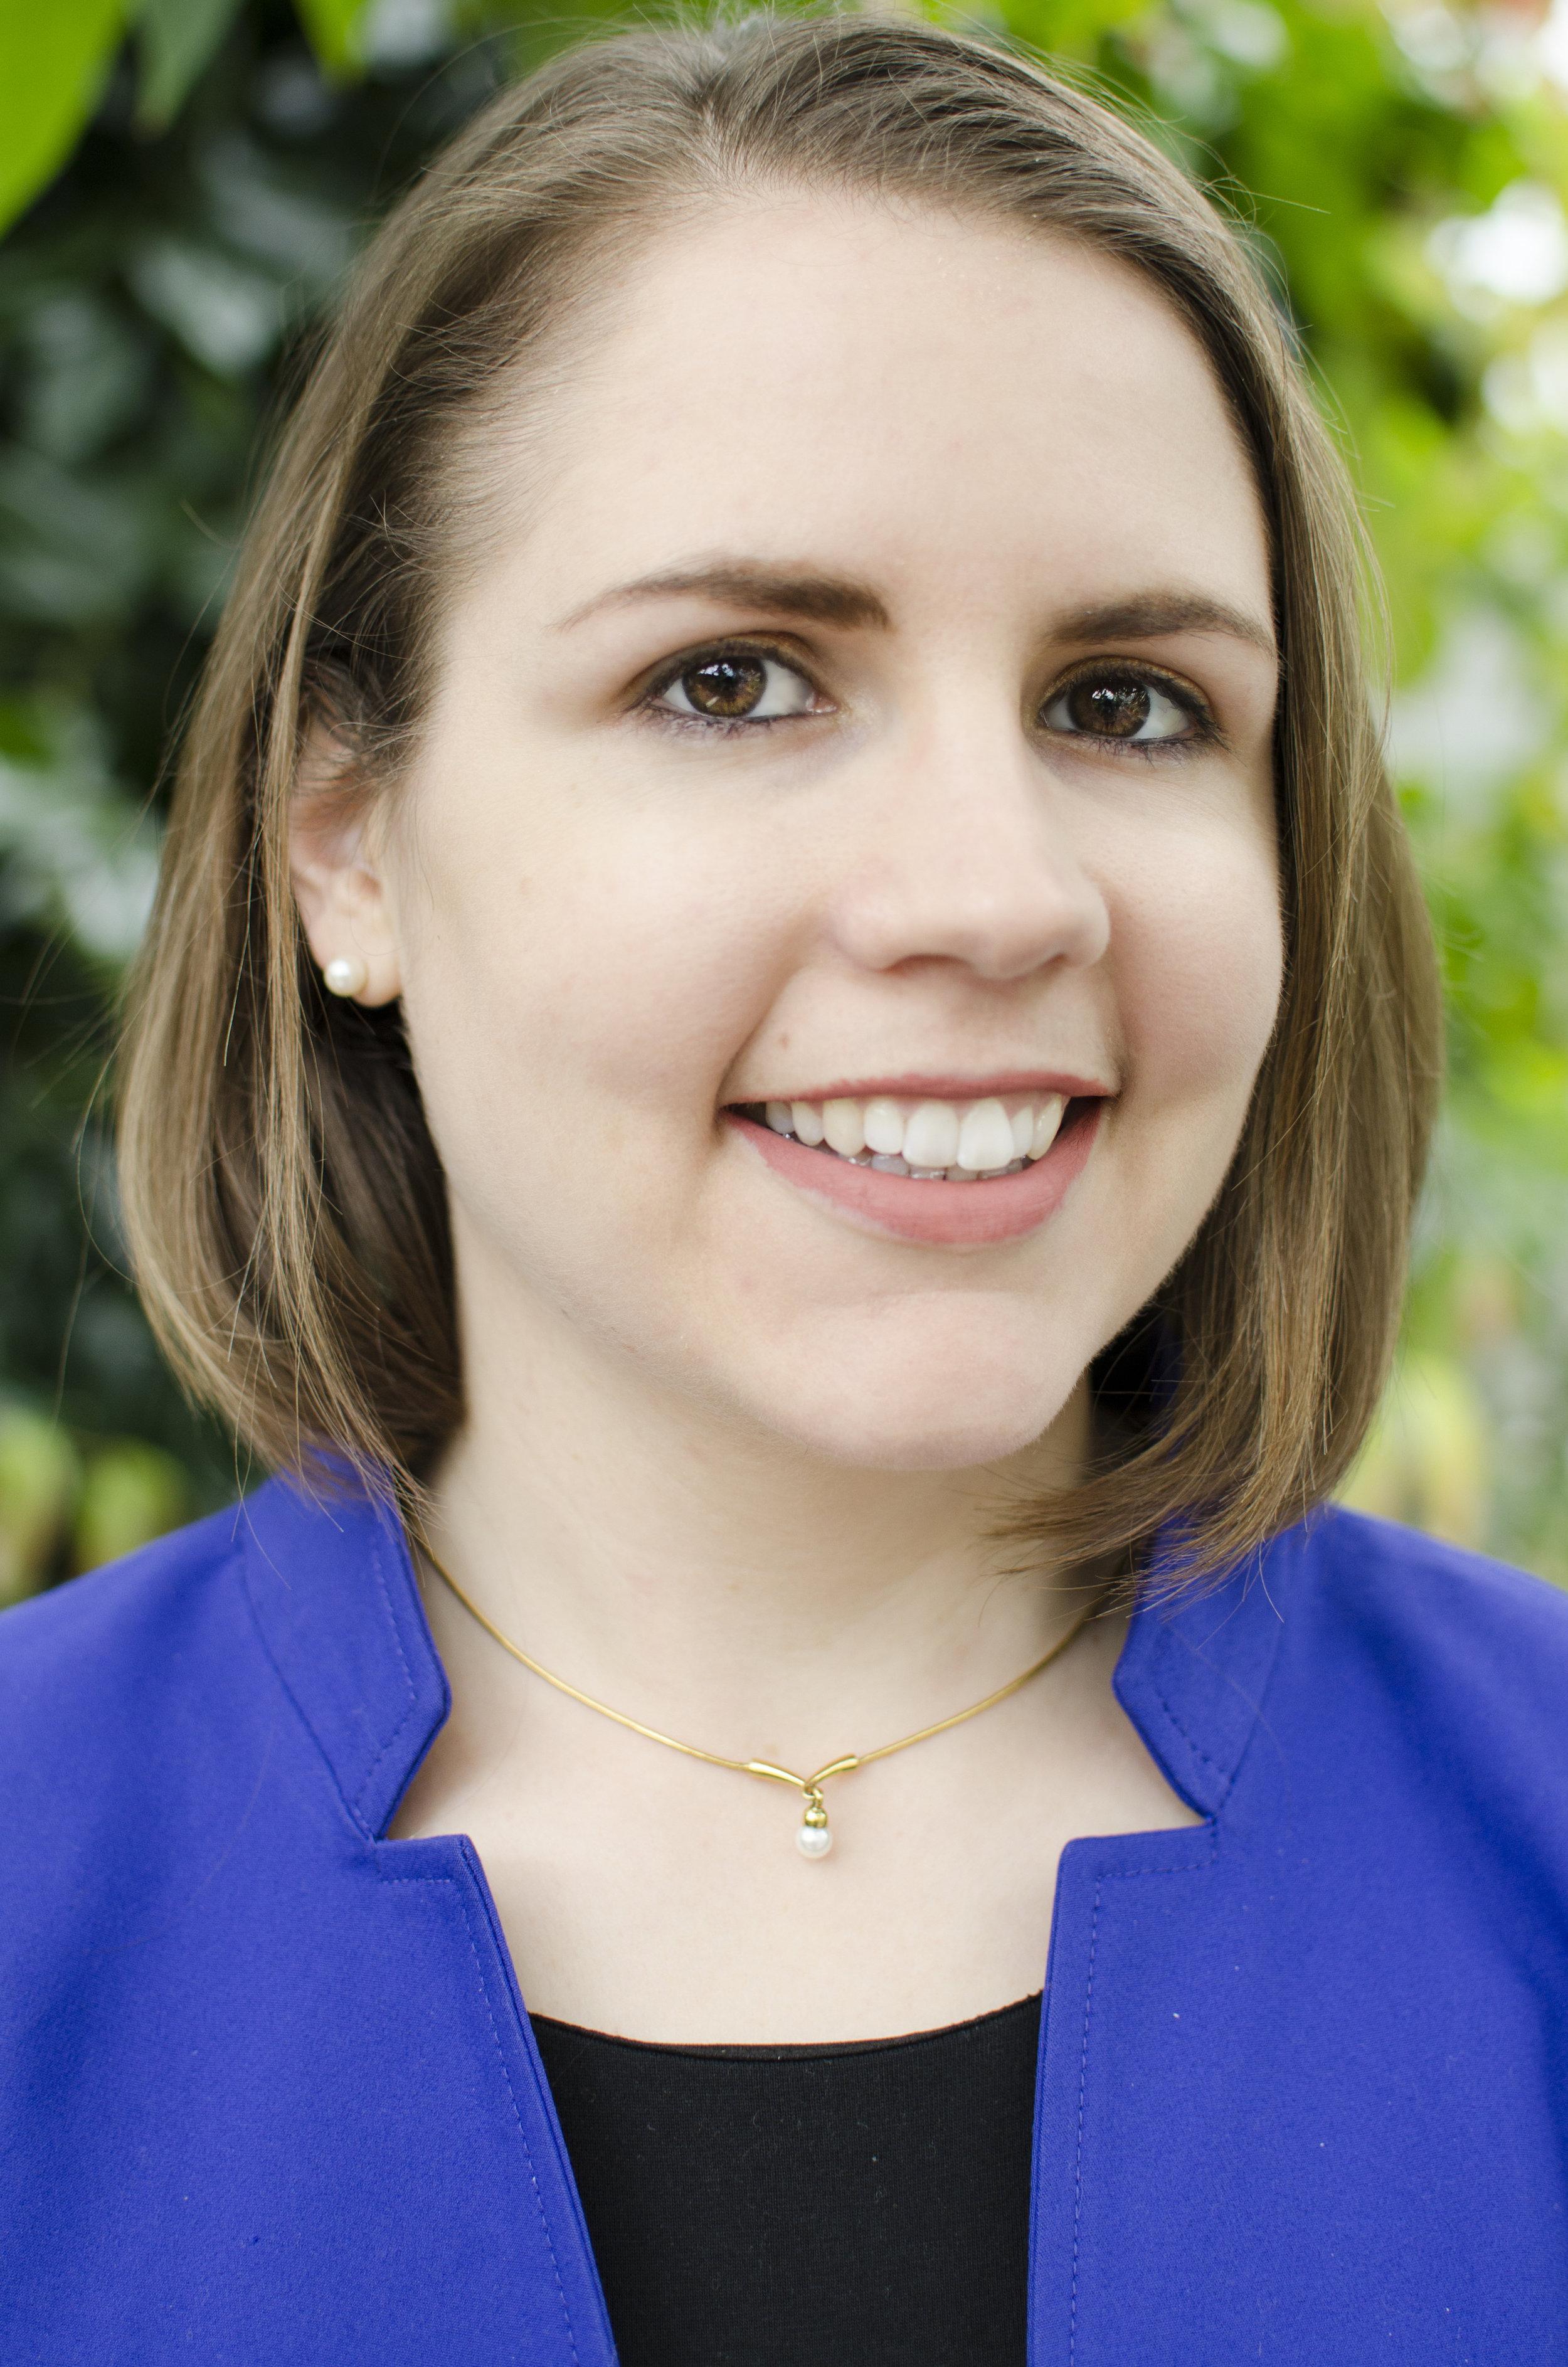 Laura Drescher headshot portrait.jpg